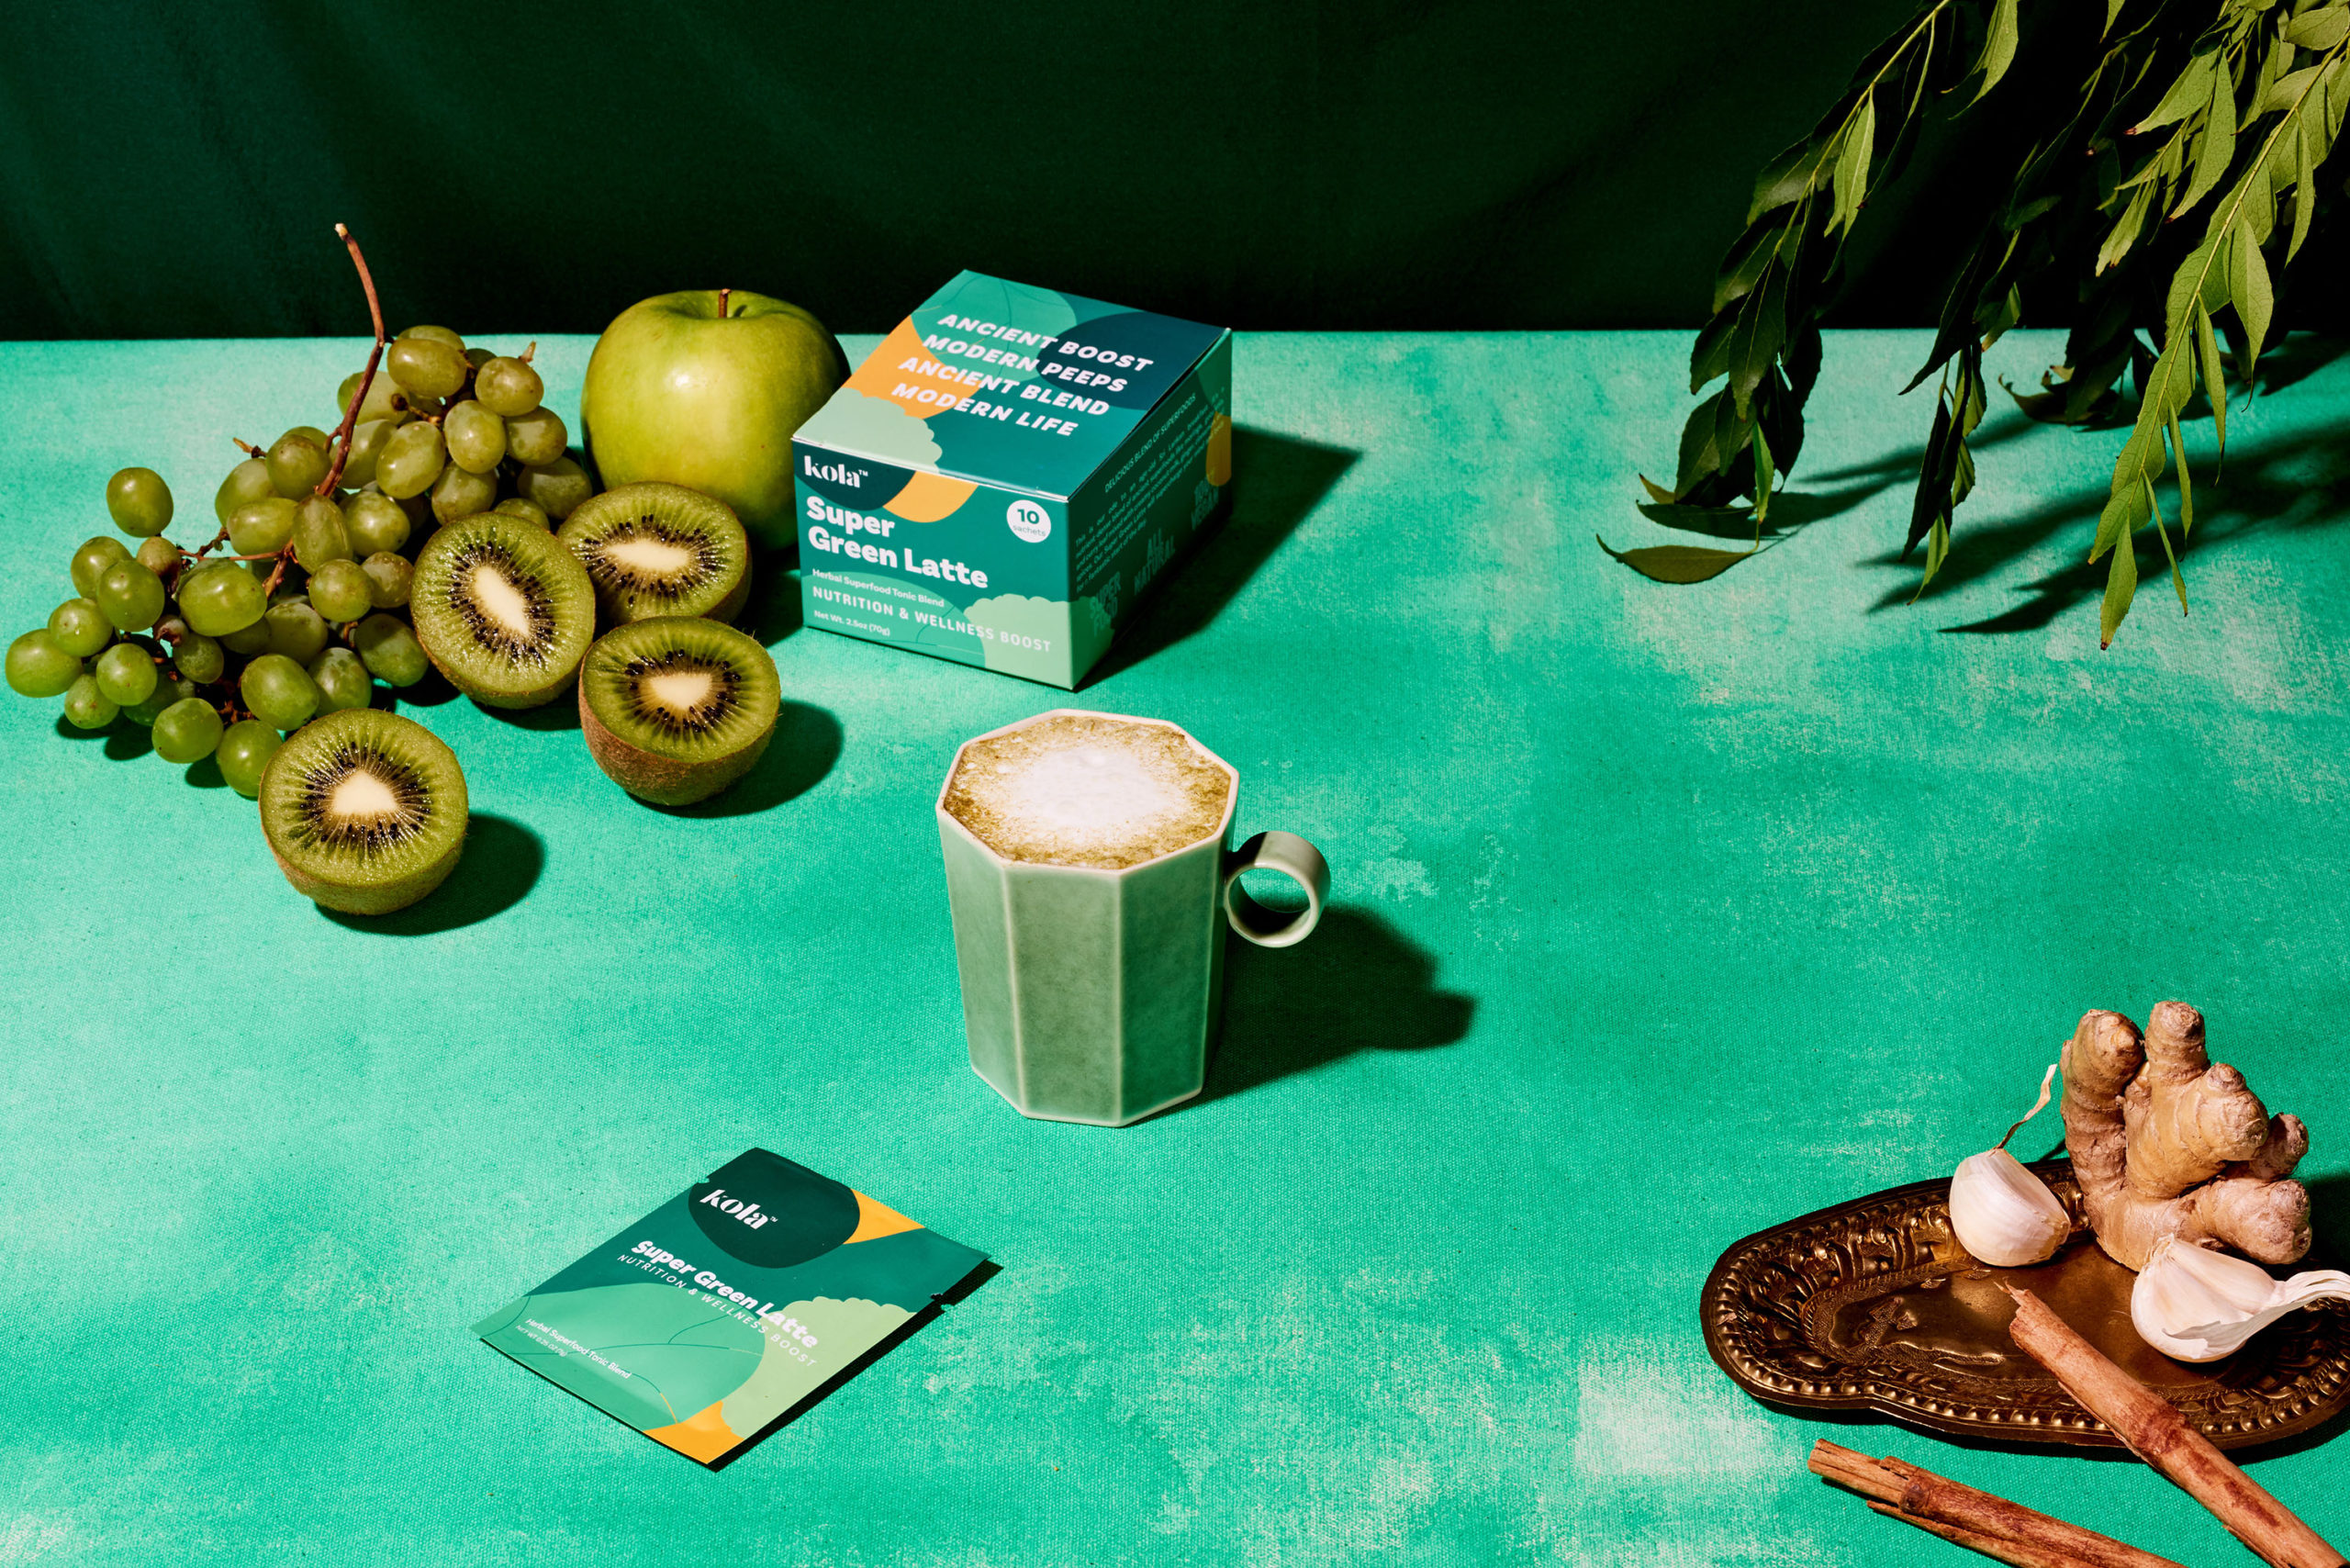 Kola – Super Green Latte v.2 web